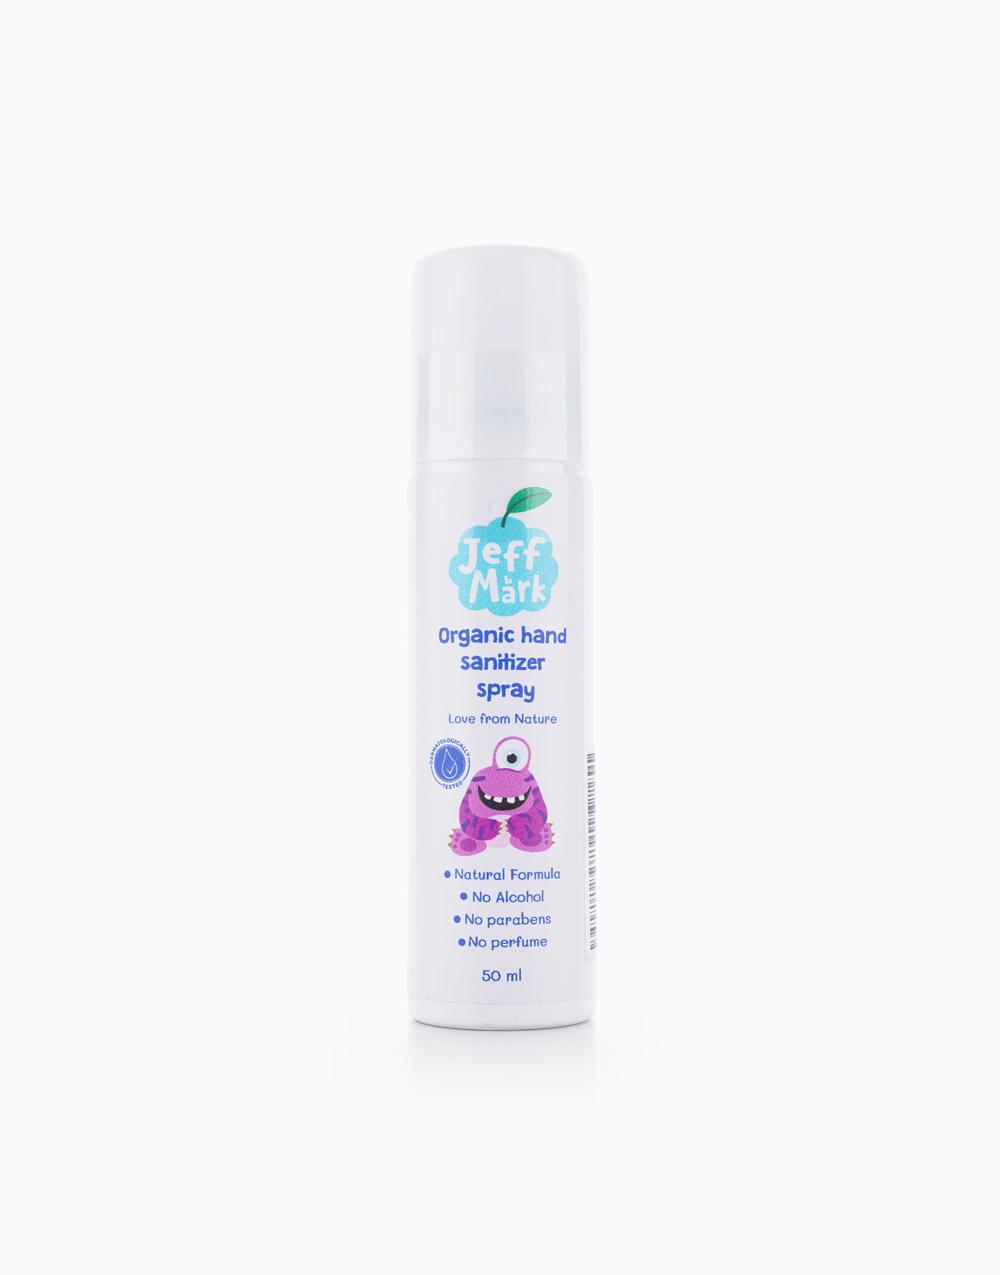 Organic Hand Sanitizer Spray (50ml) by Jeff & Mark